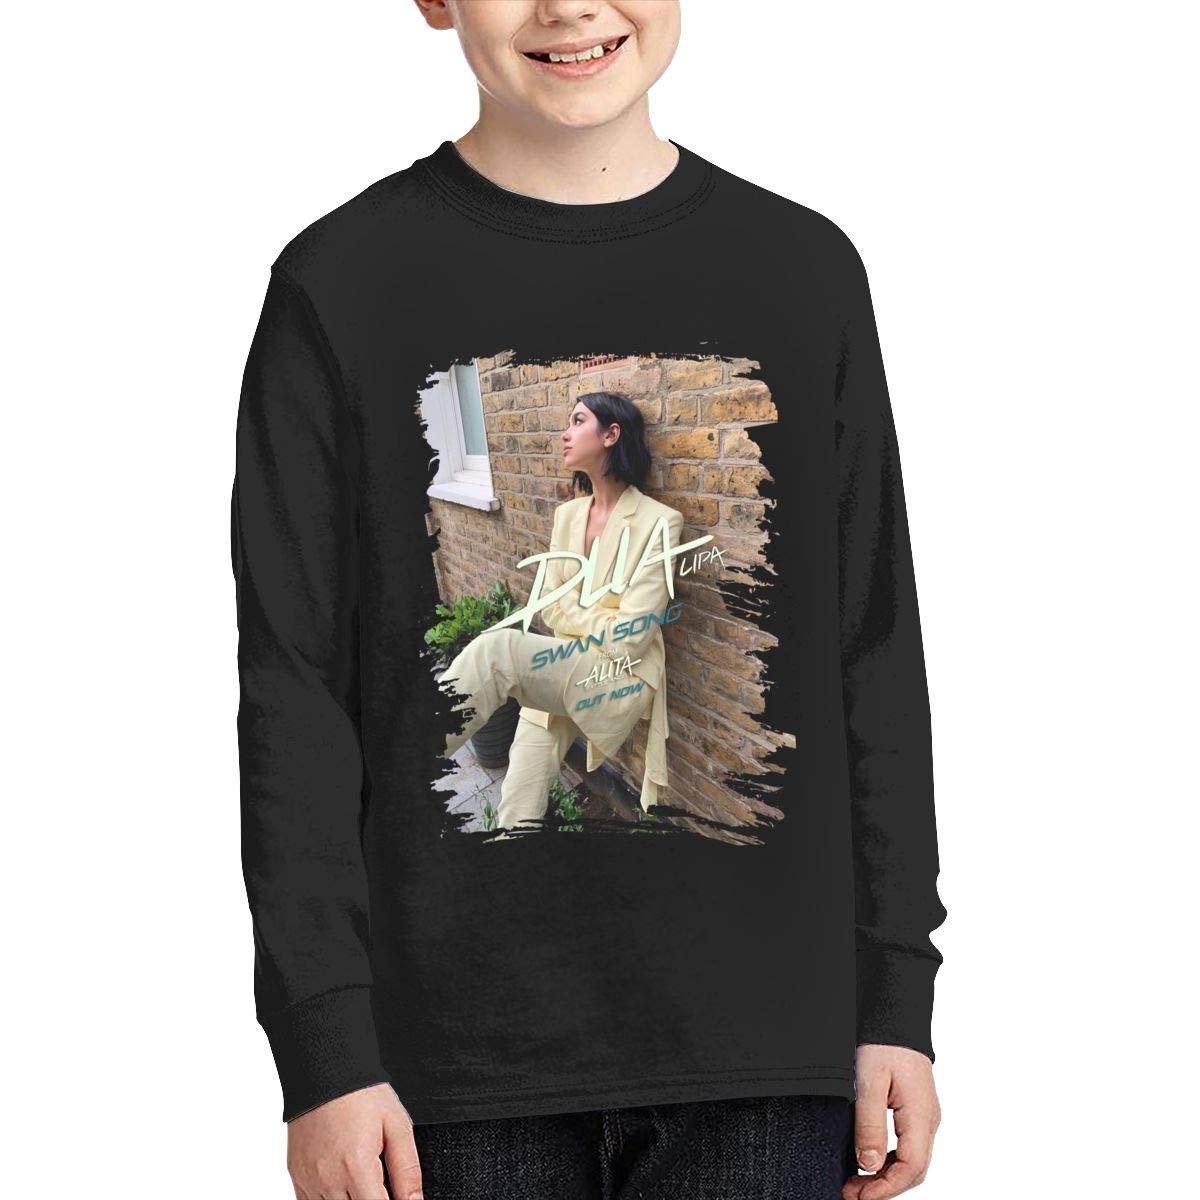 MichaelHazzard Dua Lipa Youth Casual Long Sleeve Crewneck Tee T-Shirt for Boys and Girls